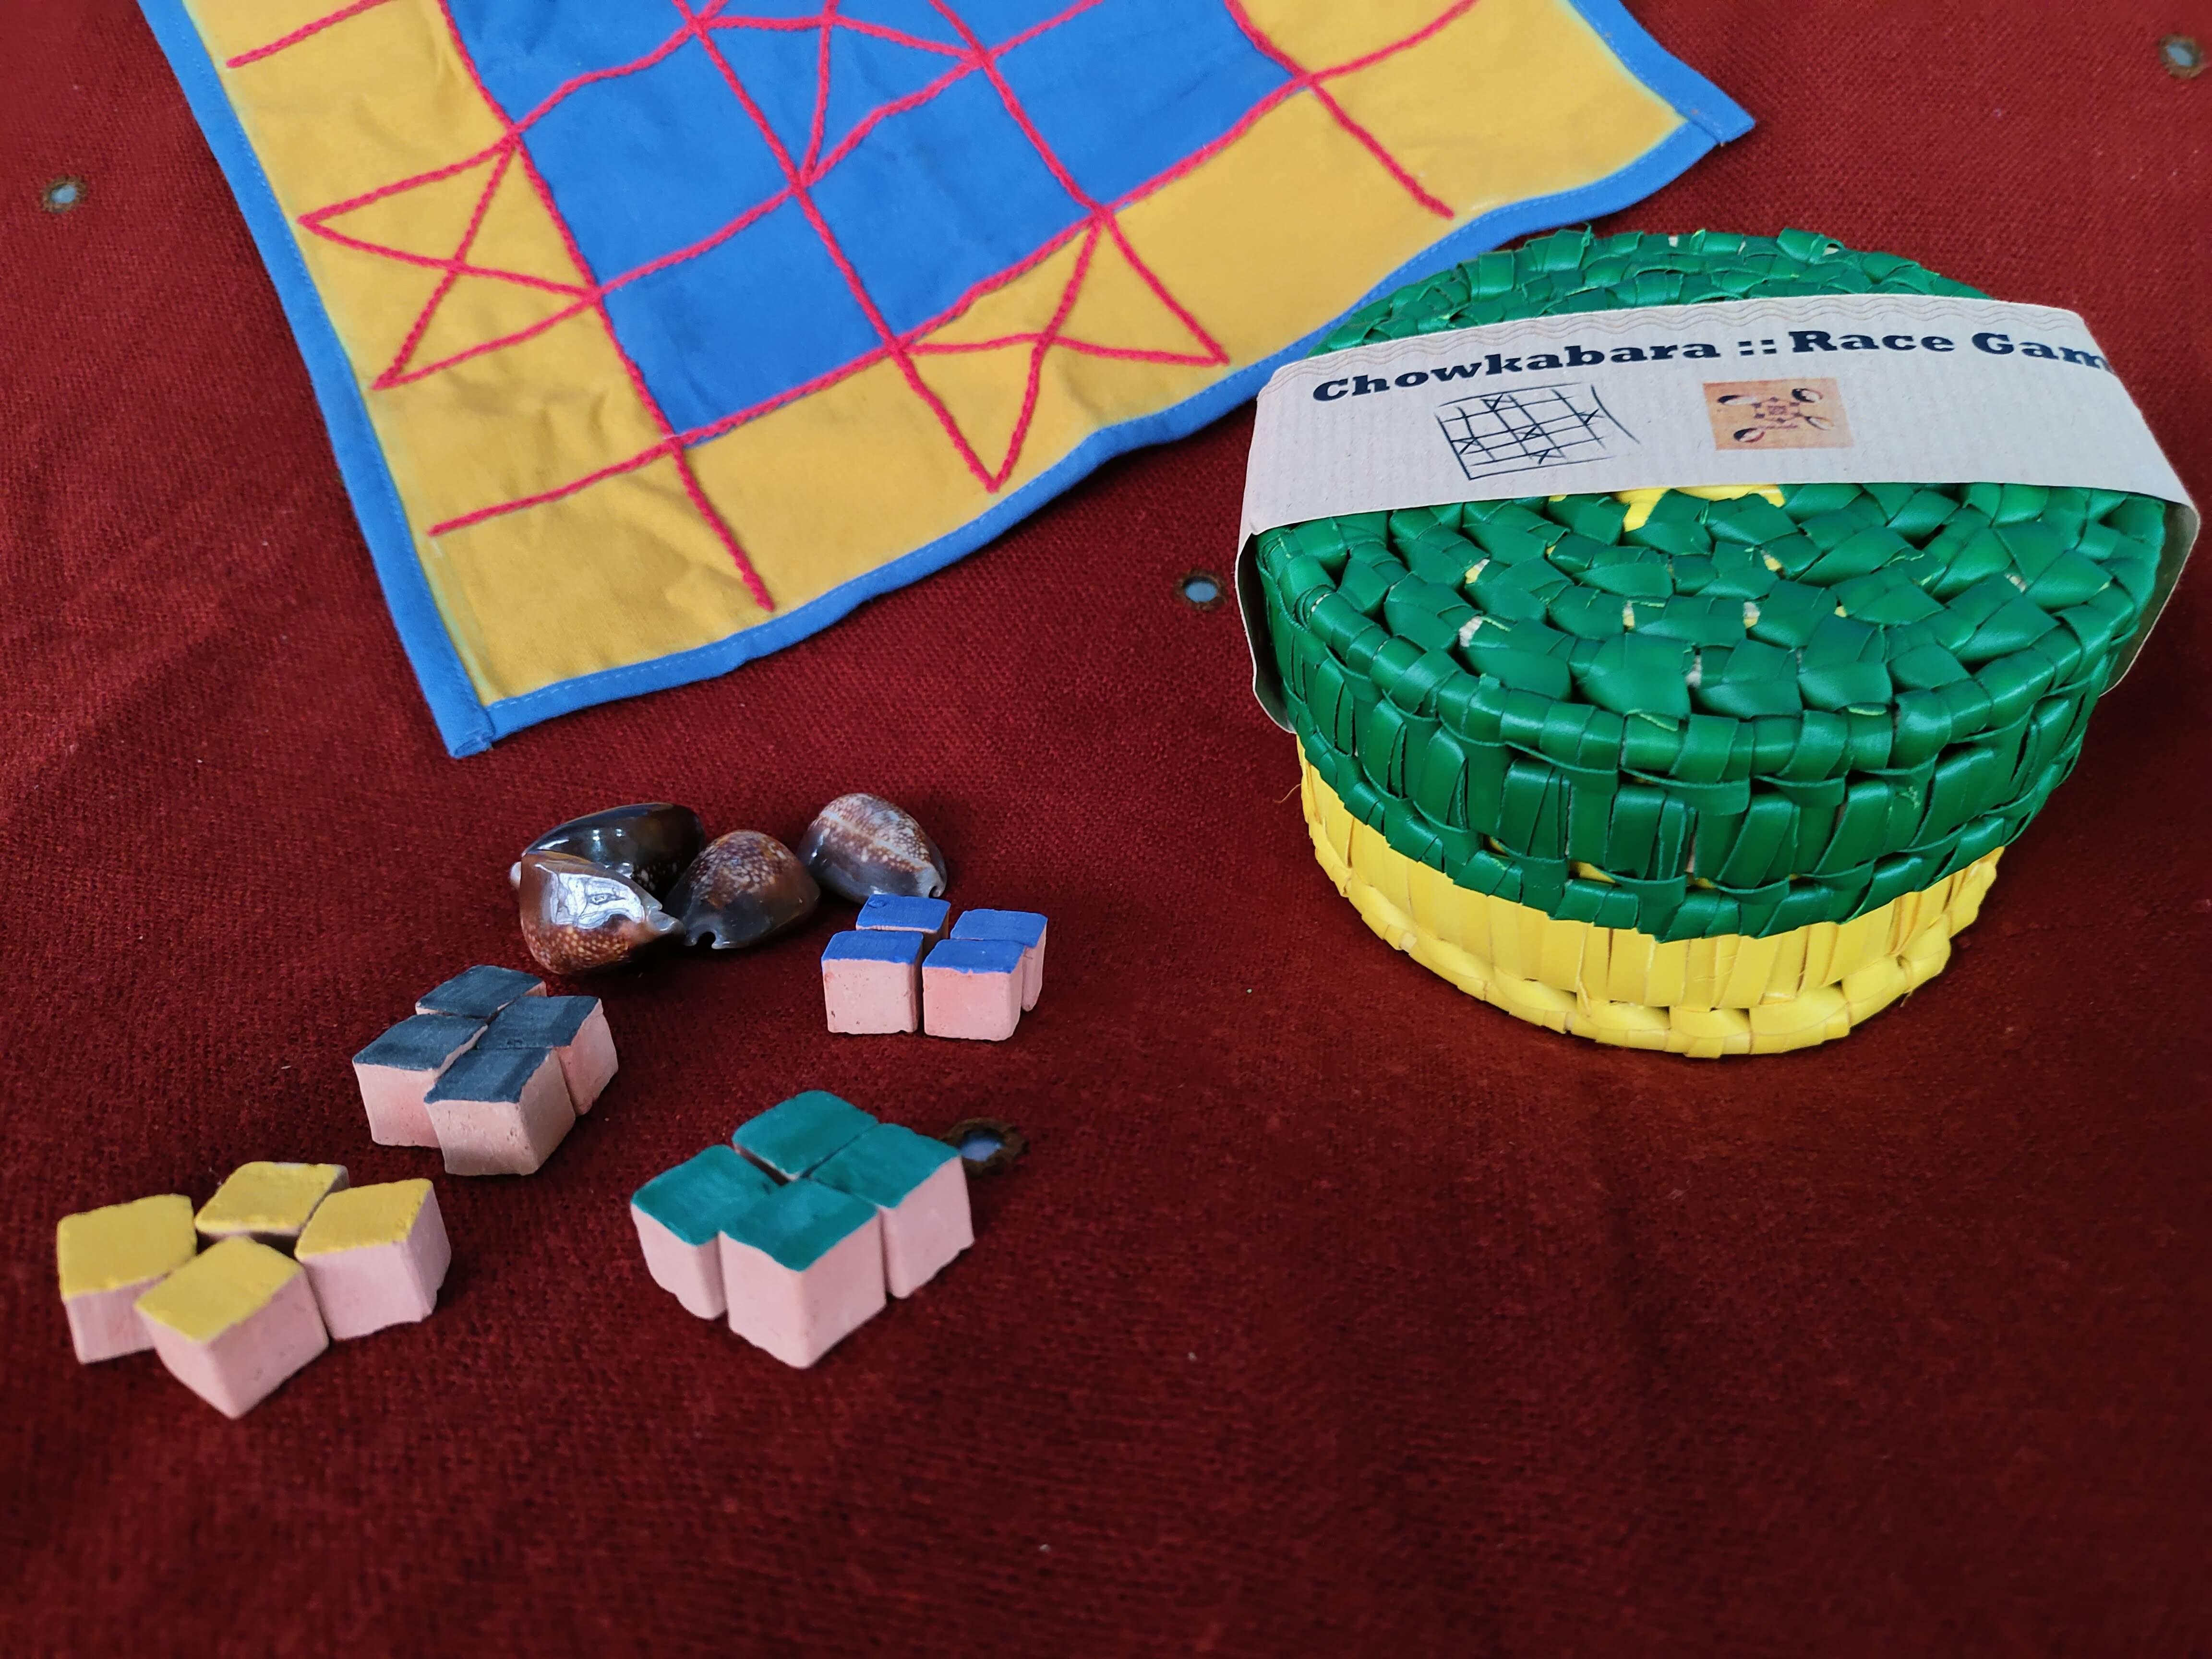 Chowkabara 5x5 game set-embroidered